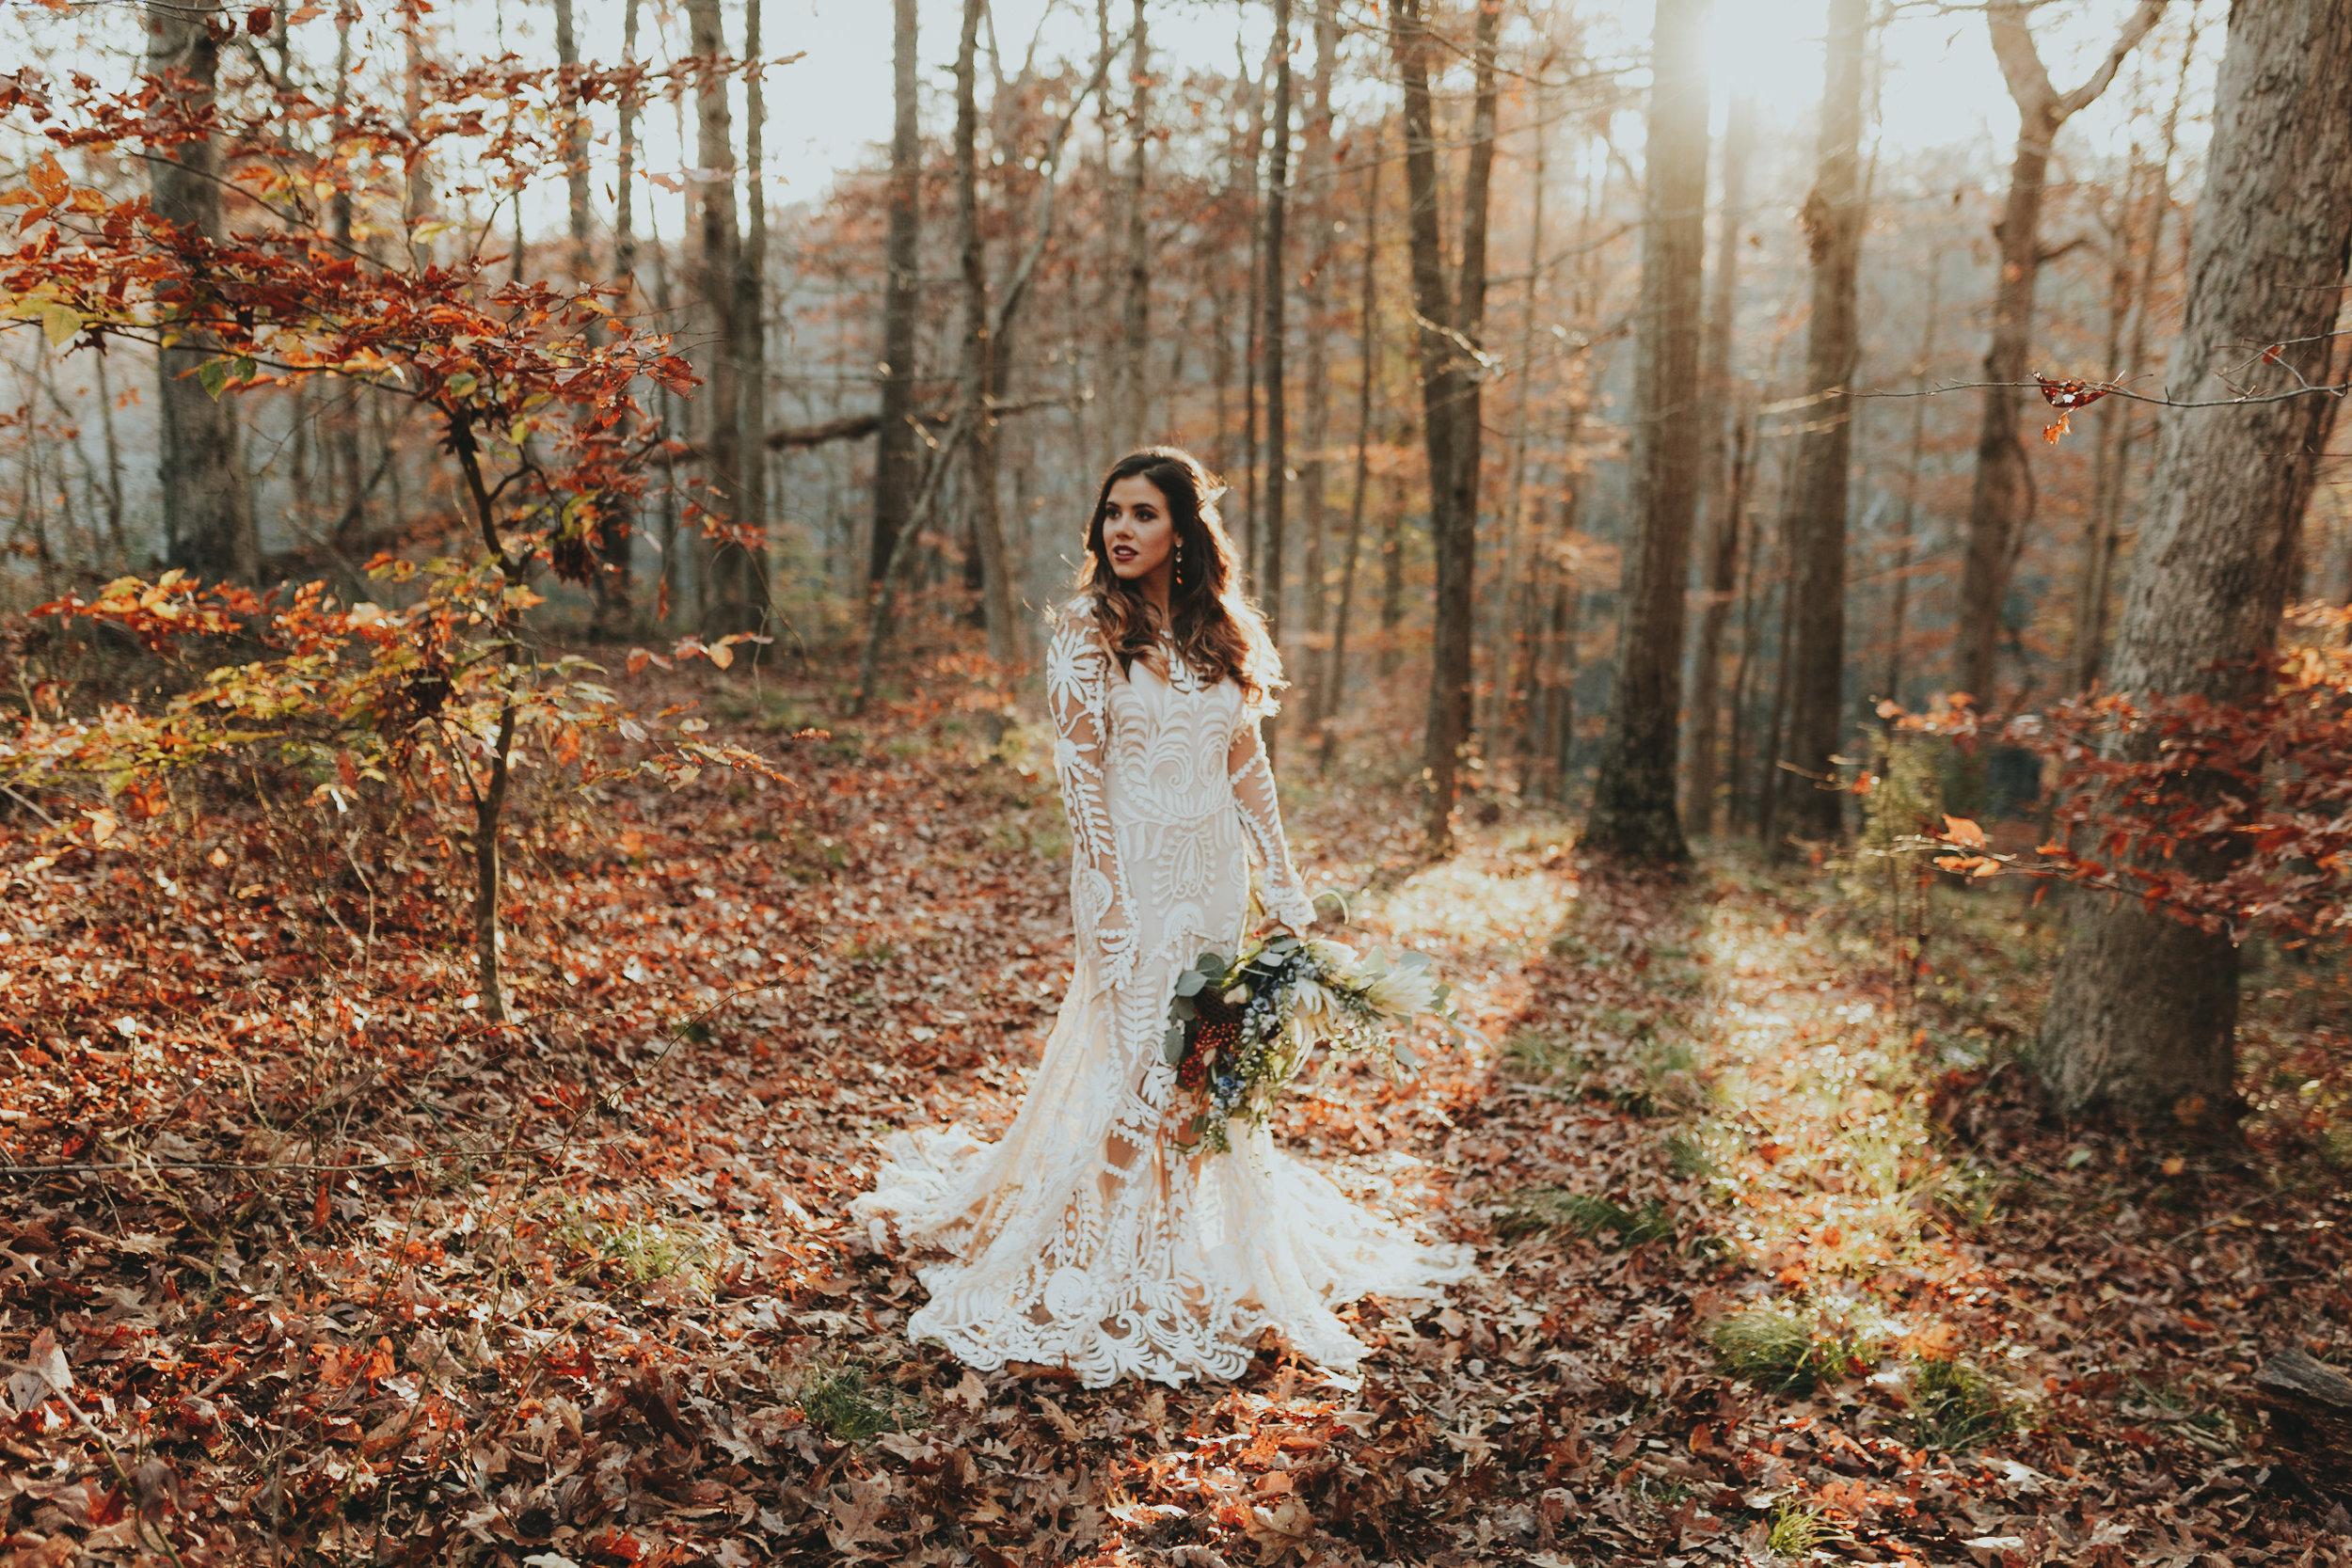 Top Wedding Photographer Bachelor Bachelorette Wedding Photographer Celebrity Weddings Nashville TN Emily Anne Photo Art